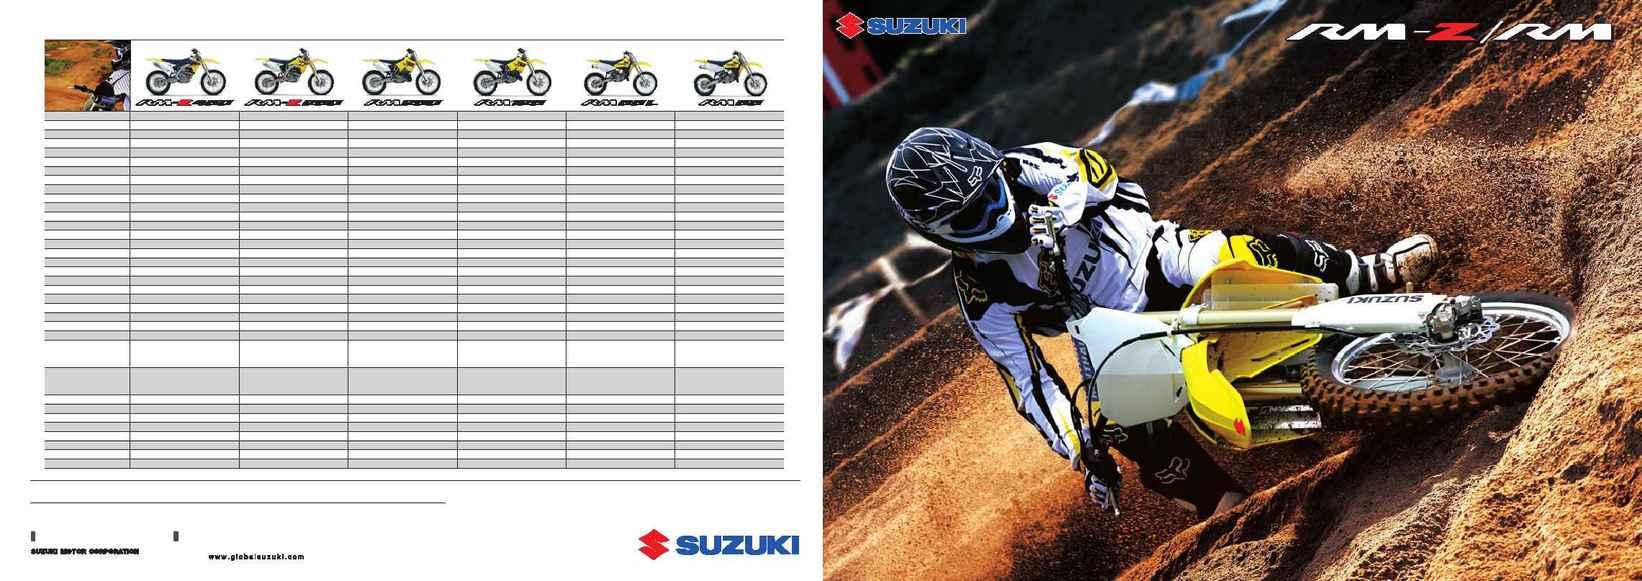 Suzuki - RM K 8 range brochure